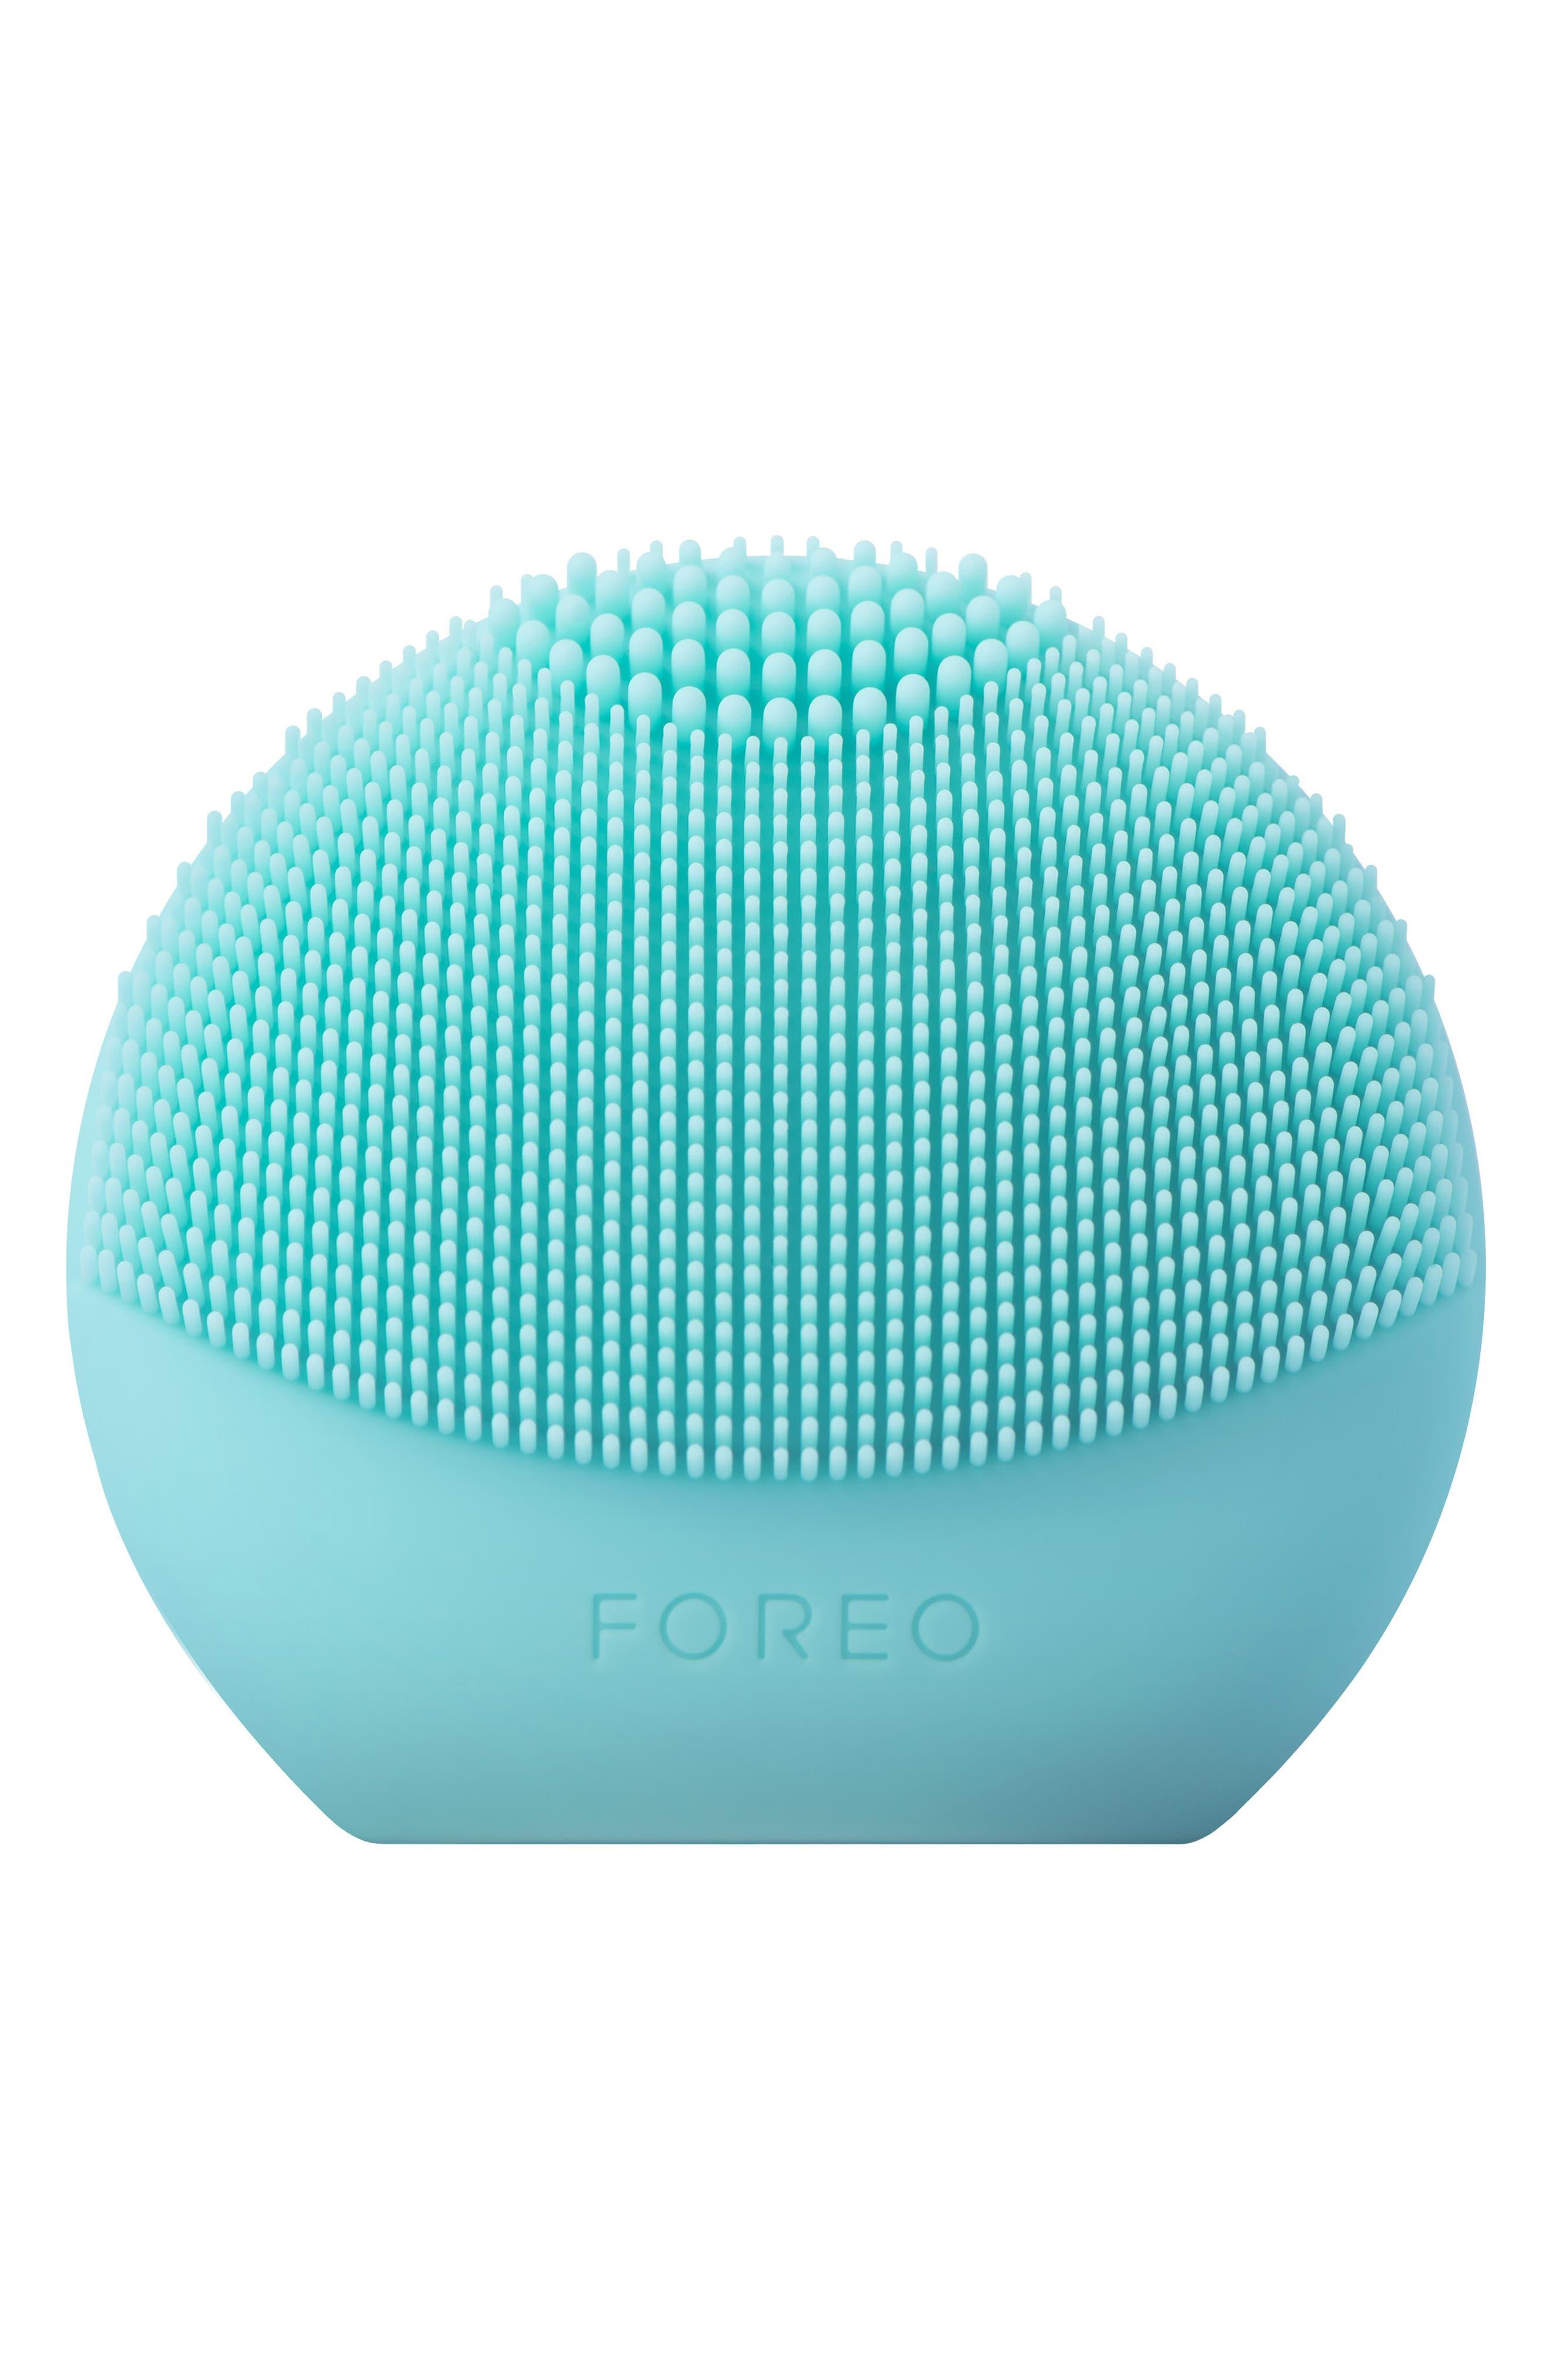 Image of FOREO LUNA™ fofo Skin Analysis Facial Cleansing Brush